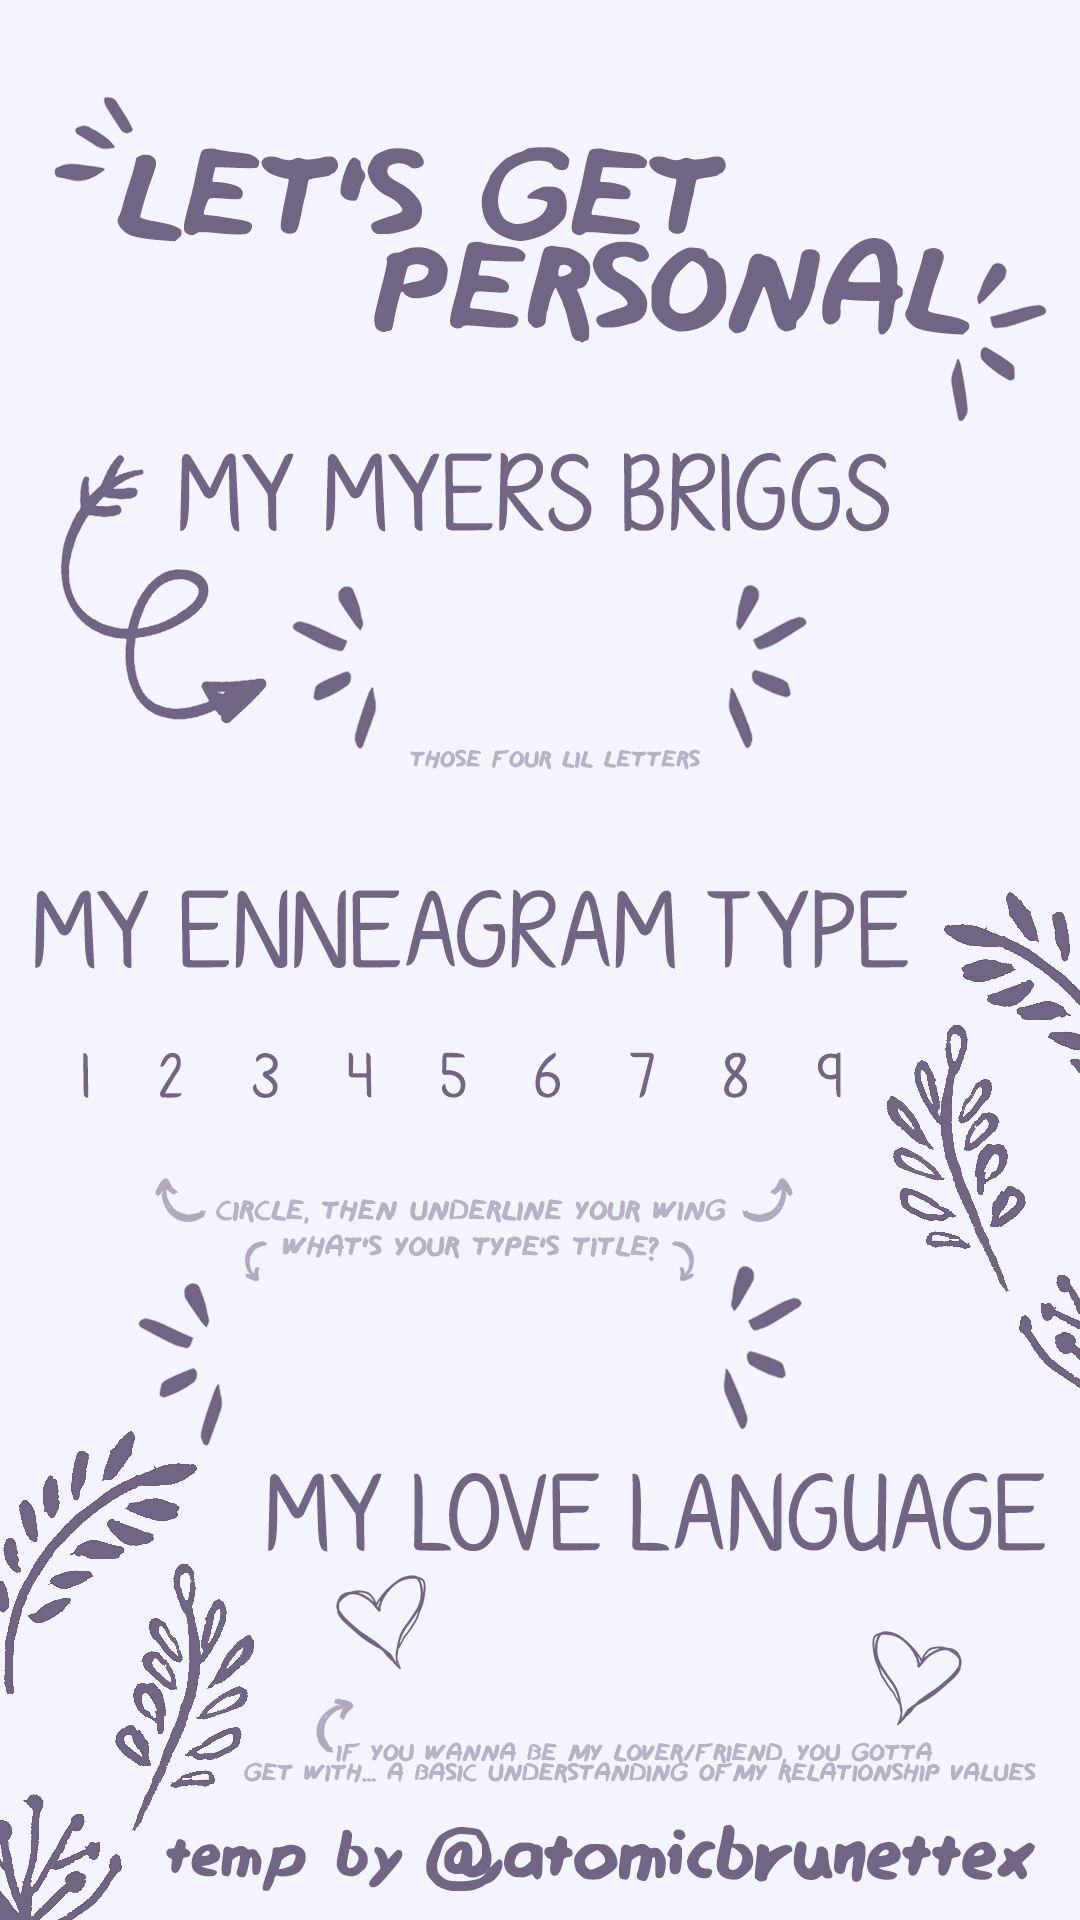 insta story template myers briggs, enneagram, love